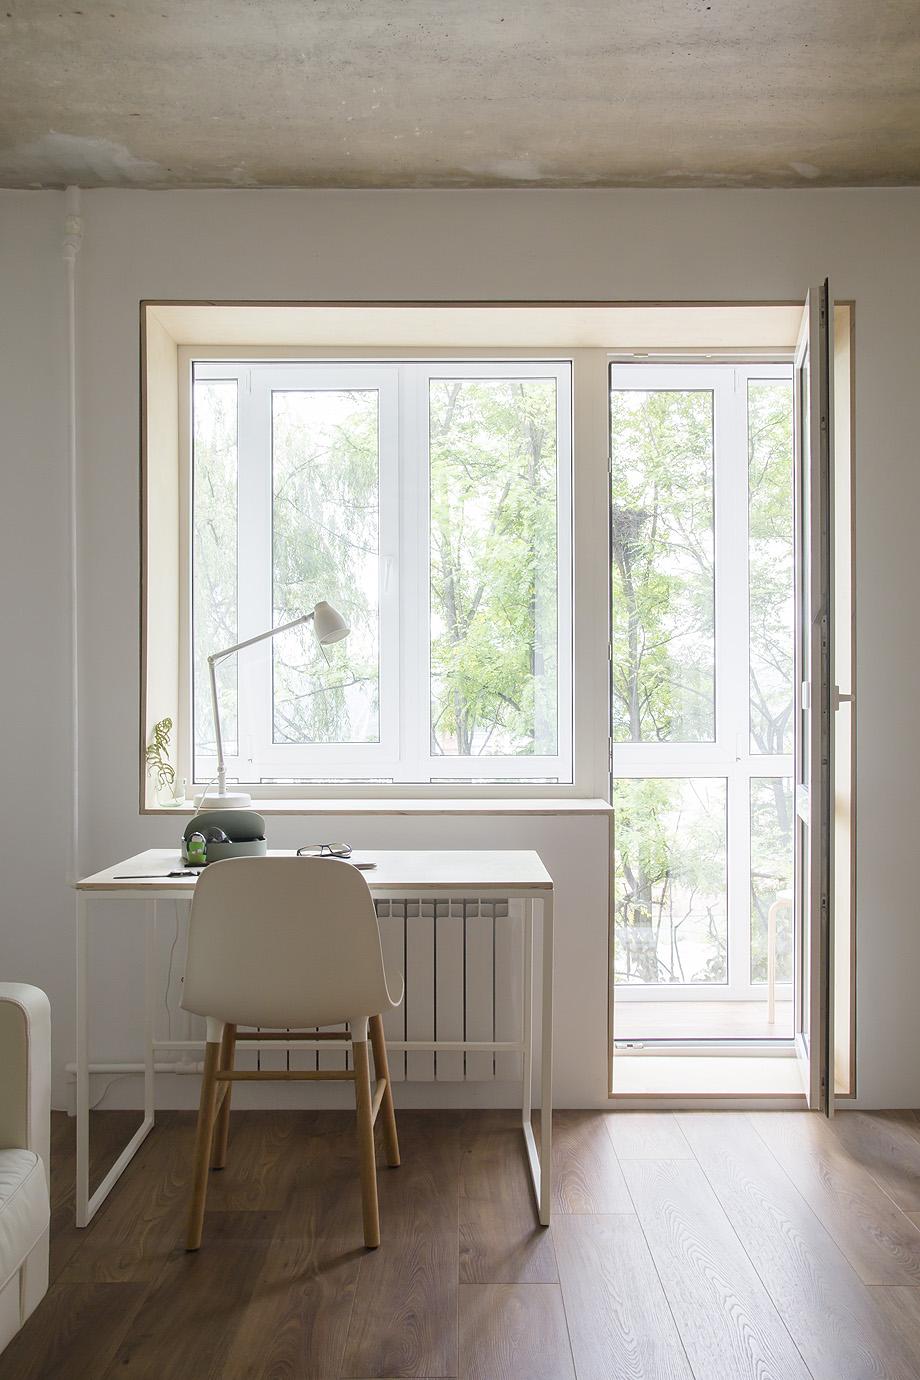 apartamento en rusia por kdva architects - foto daria koloskova (5)